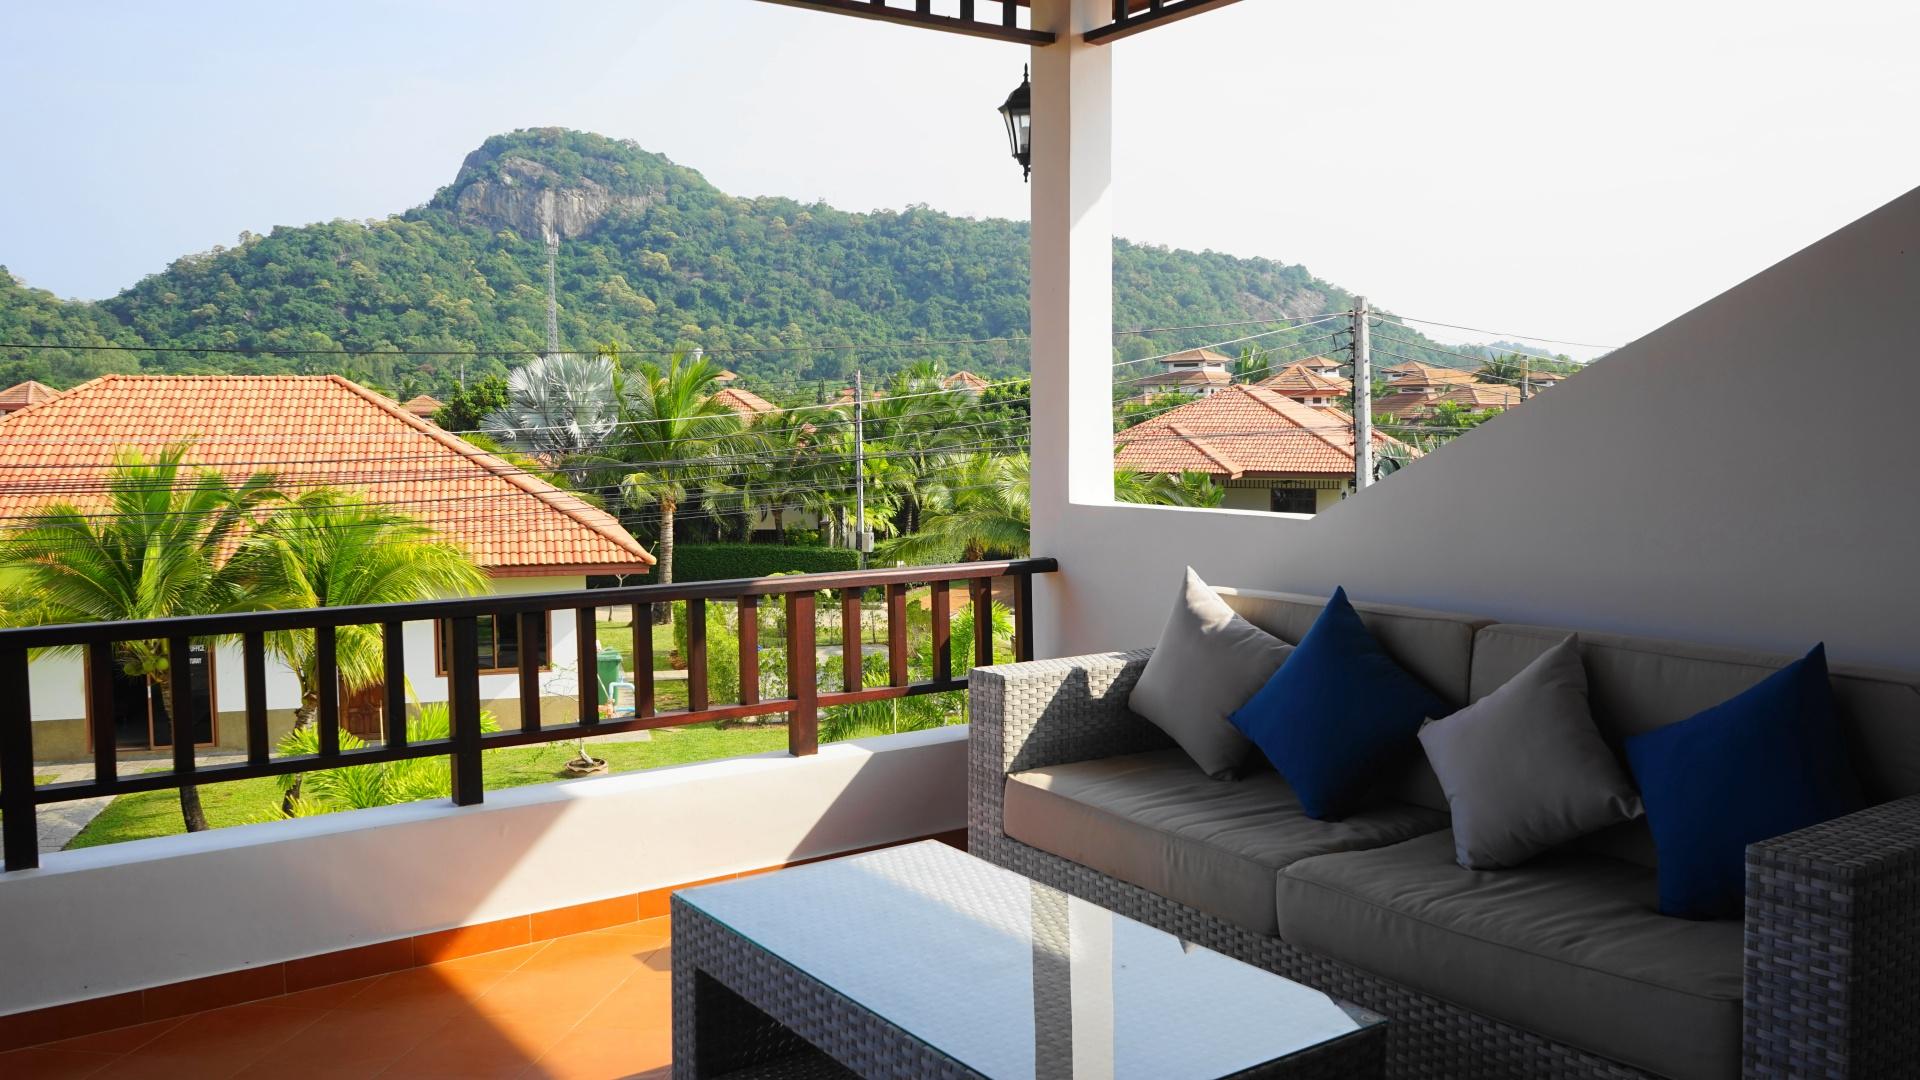 Balcony of Villa Royale F3 in Manora Village III, Hua Hin, Thailand